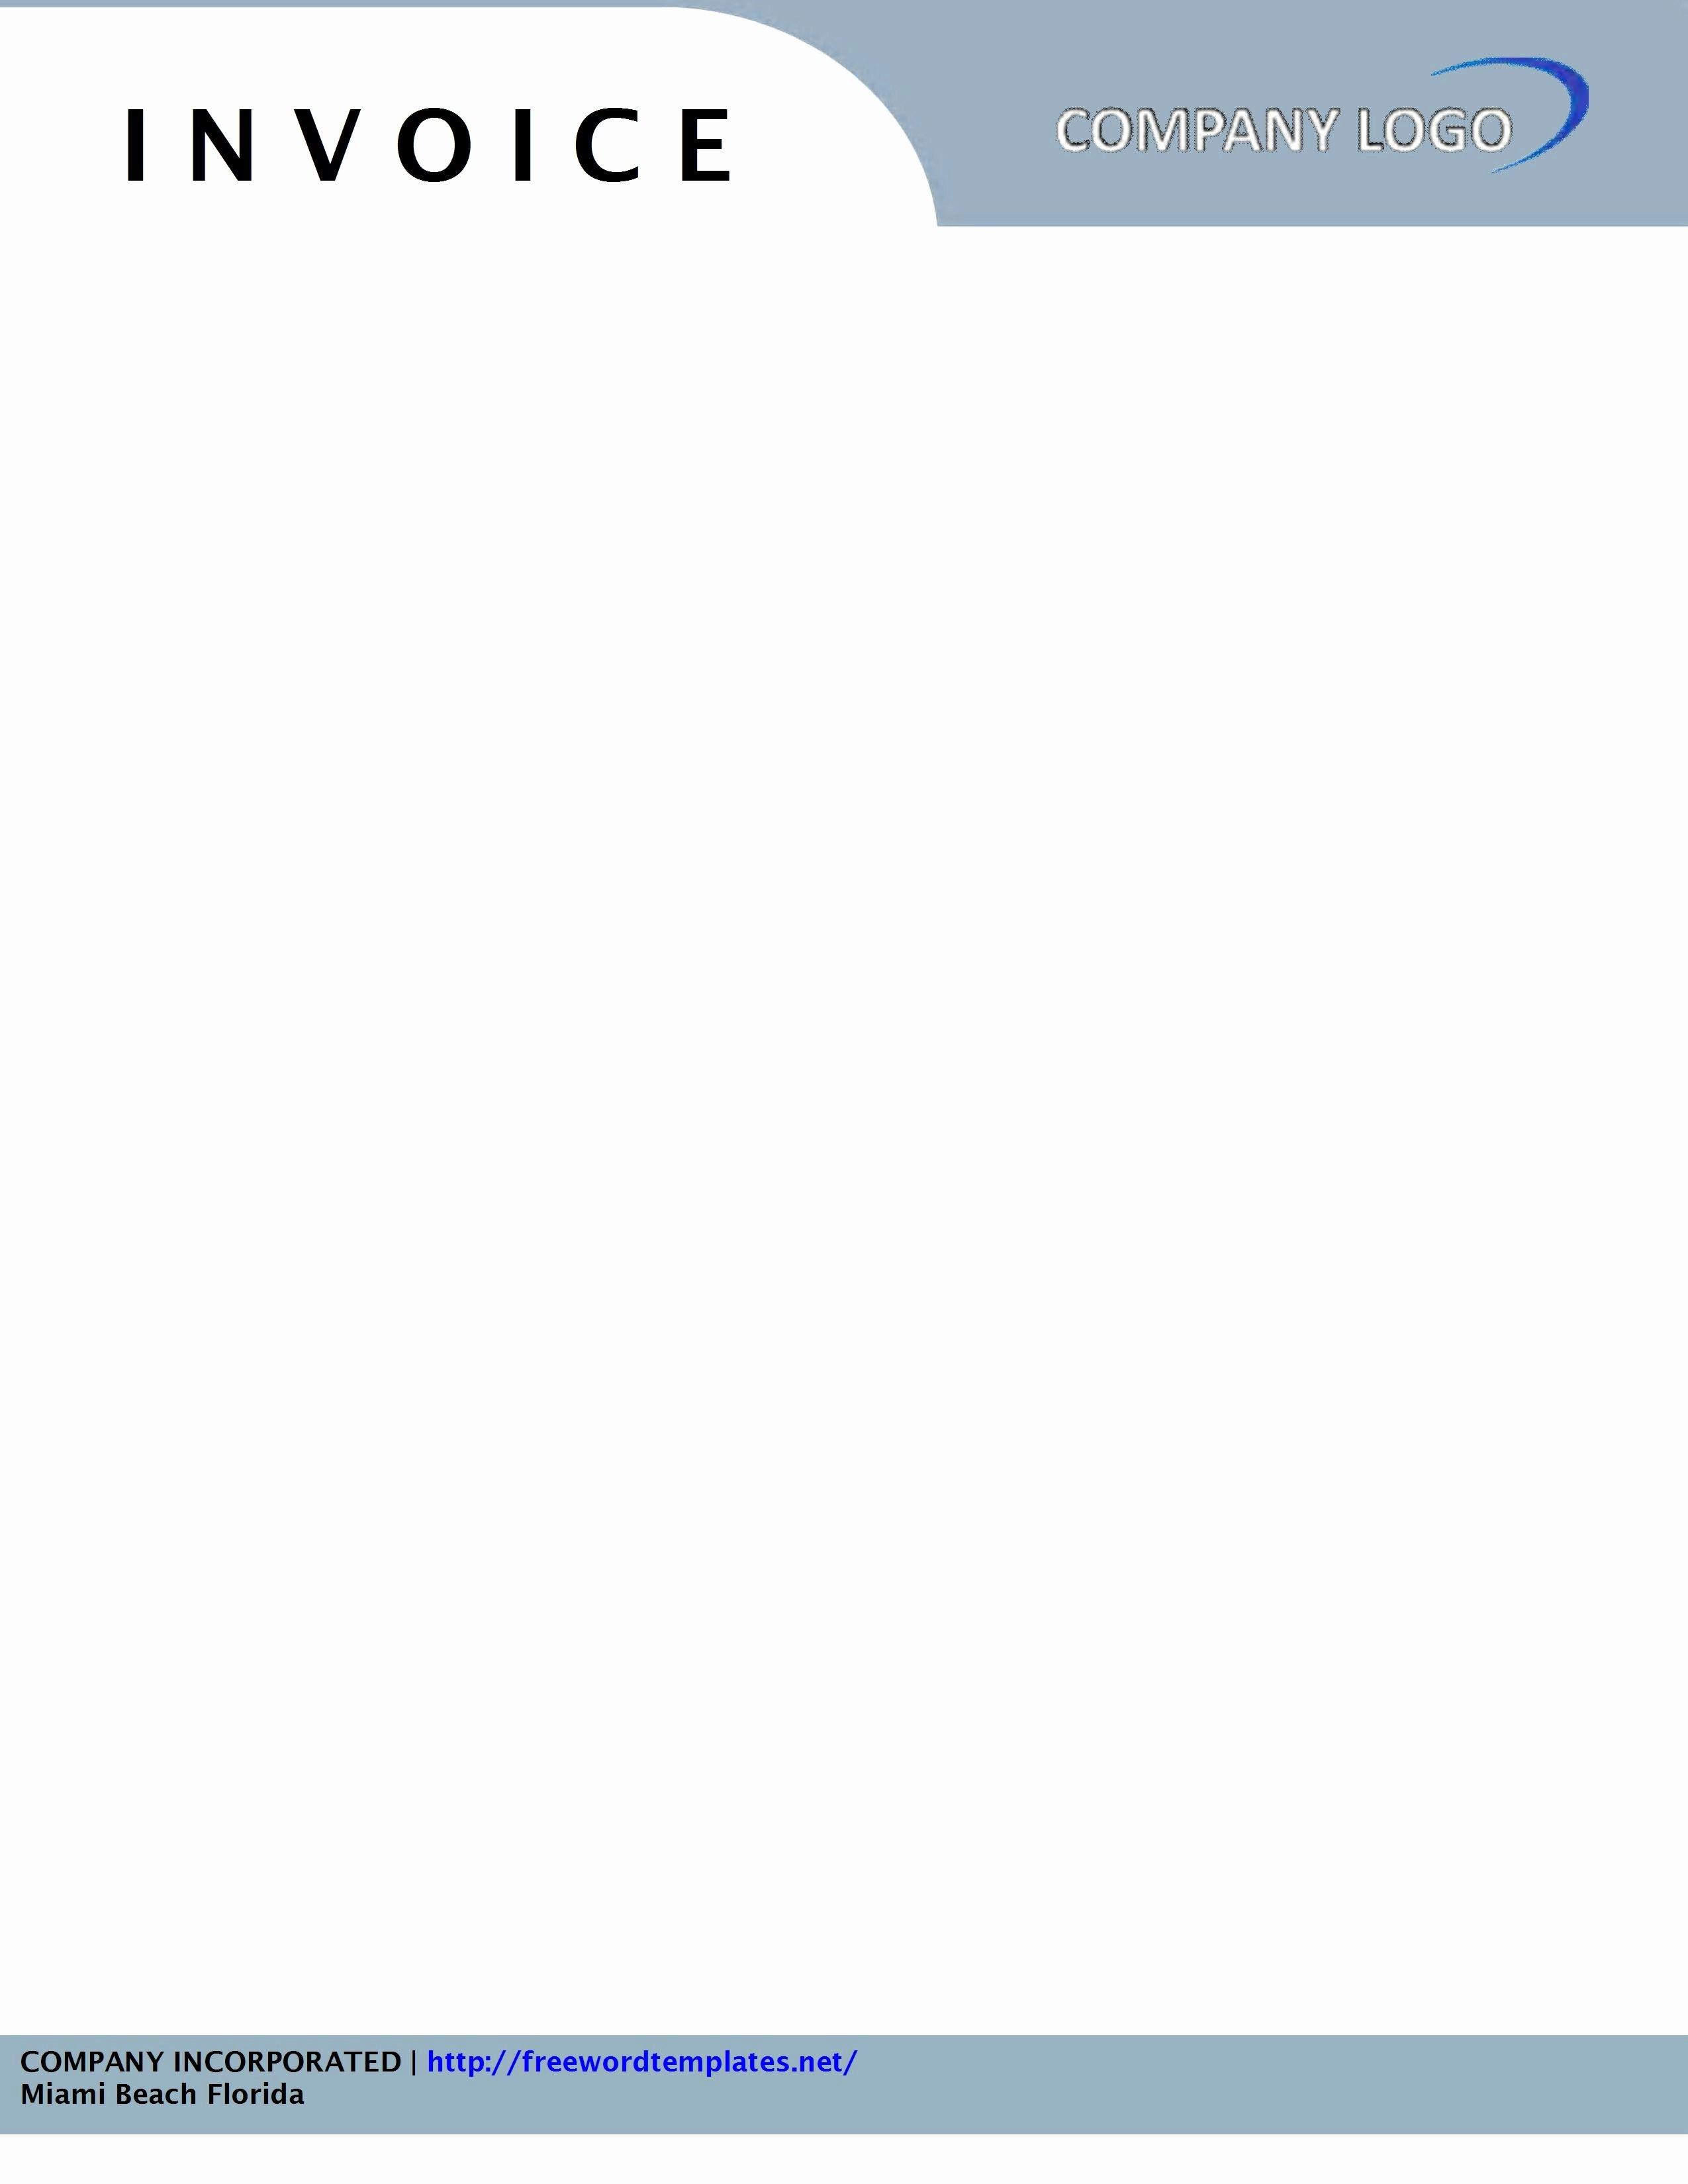 Free Letterhead Template Word Lovely Invoice Letterhead